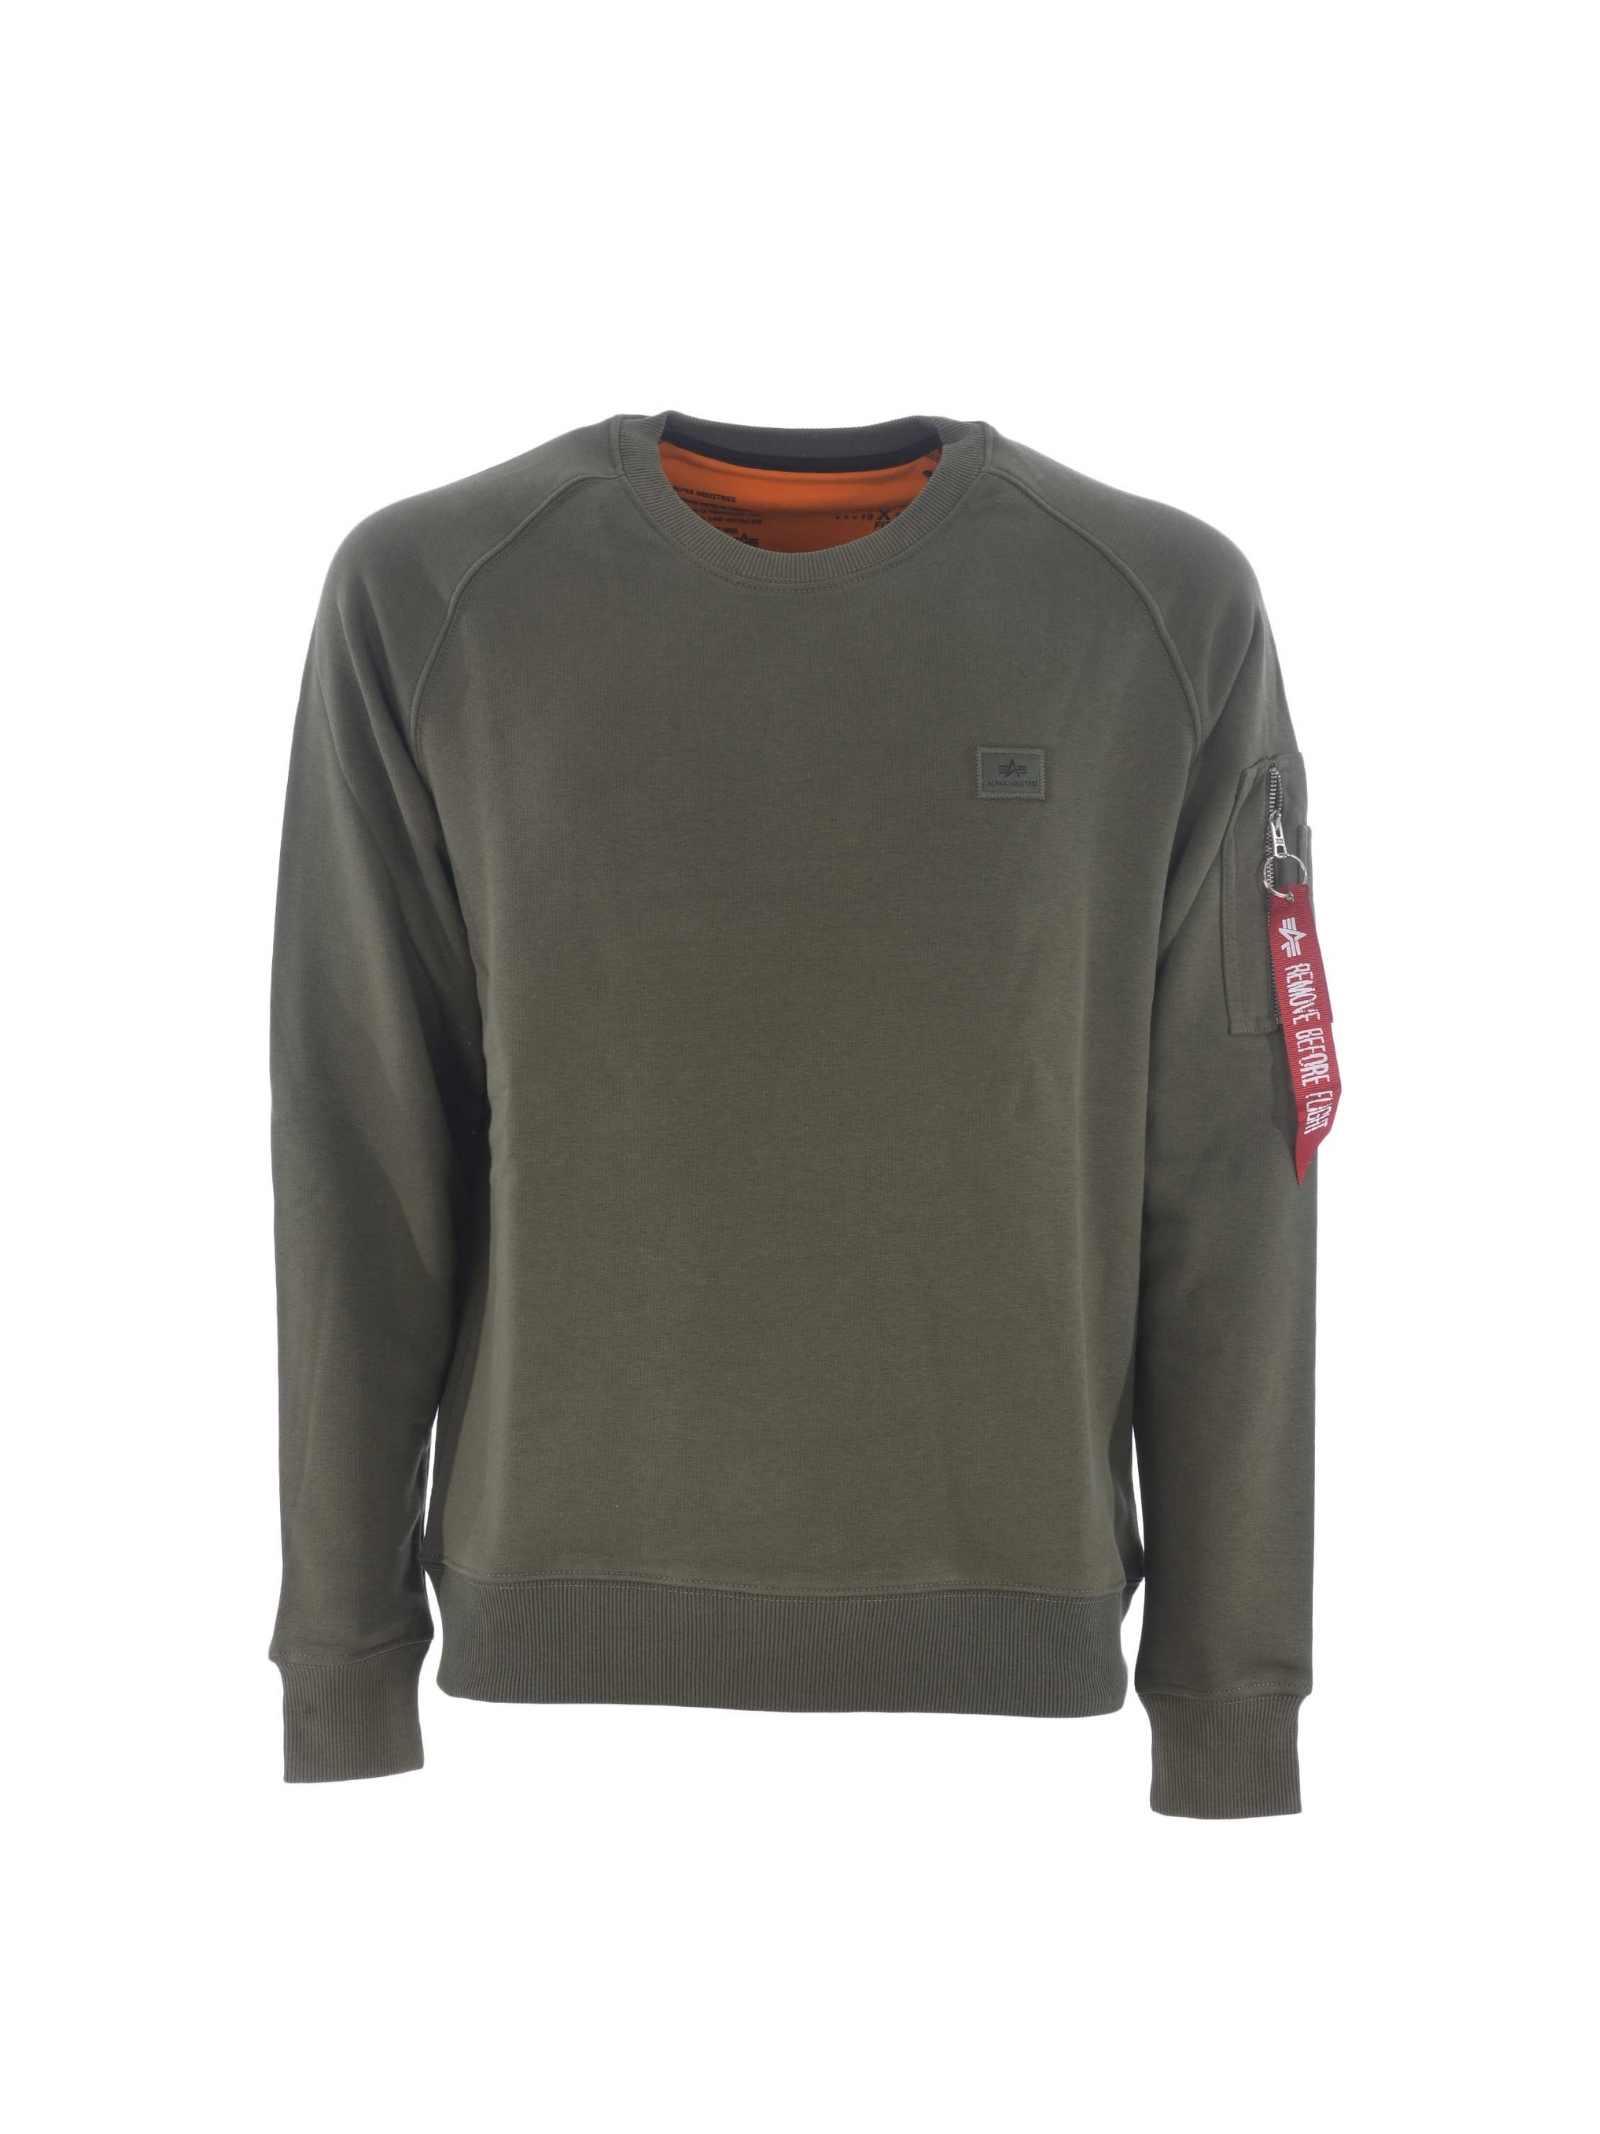 Green crewneck sweatshirt ALPHA INDUSTRIES | Sweatshirt | 158320257